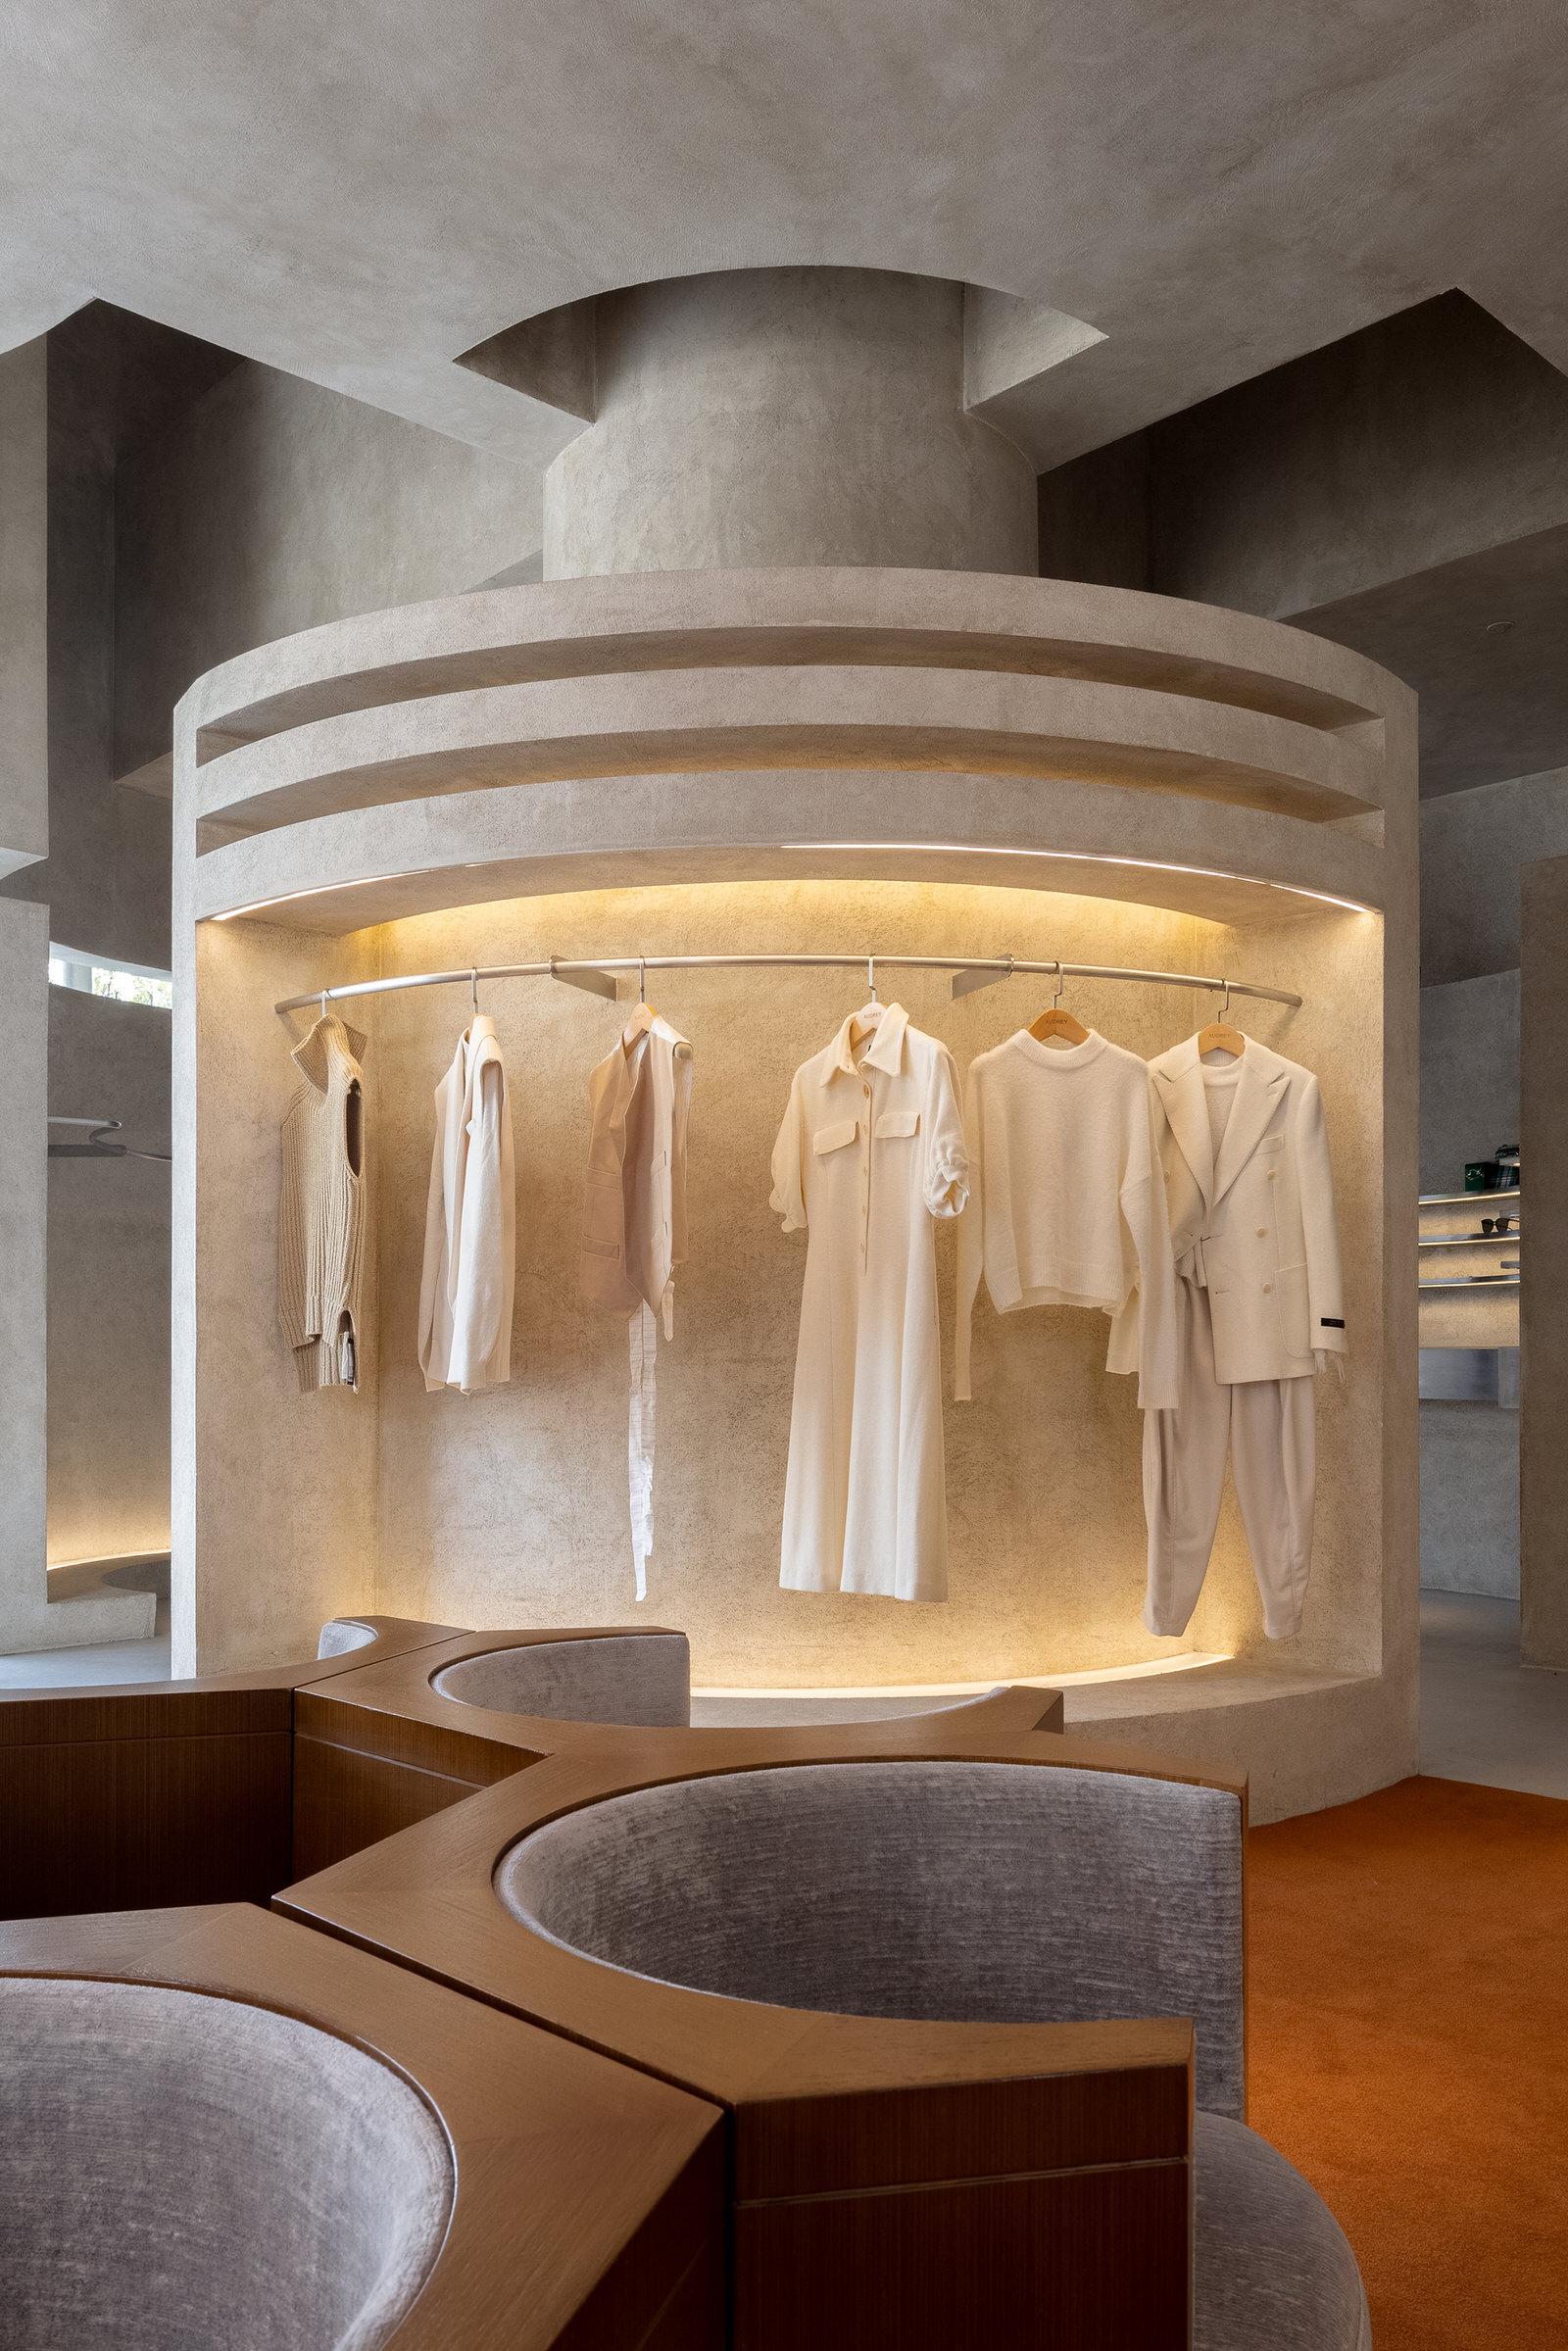 Liang Architecture Studio Audrey Boutique Hangzhou China Luxury Retail Photo Shao Feng Yellowtrace 09